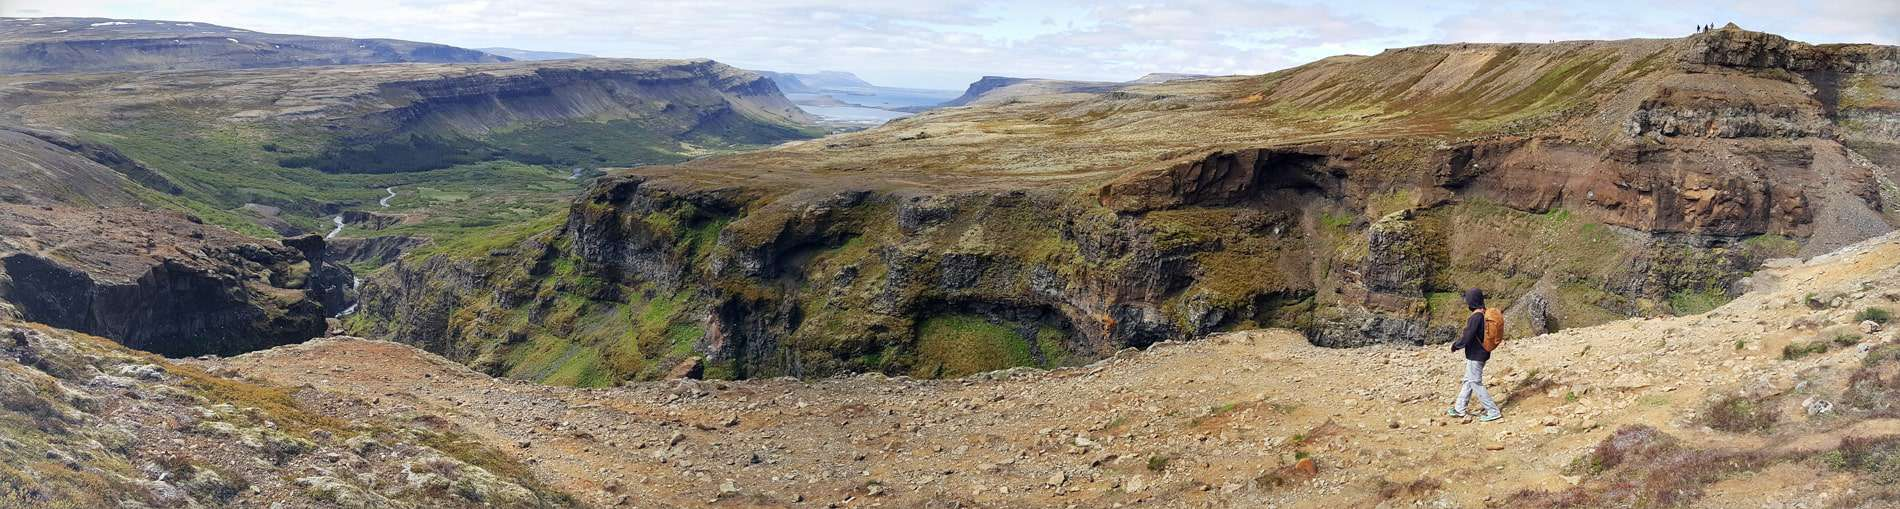 panoramic-views-from-the-glymur-waterfall